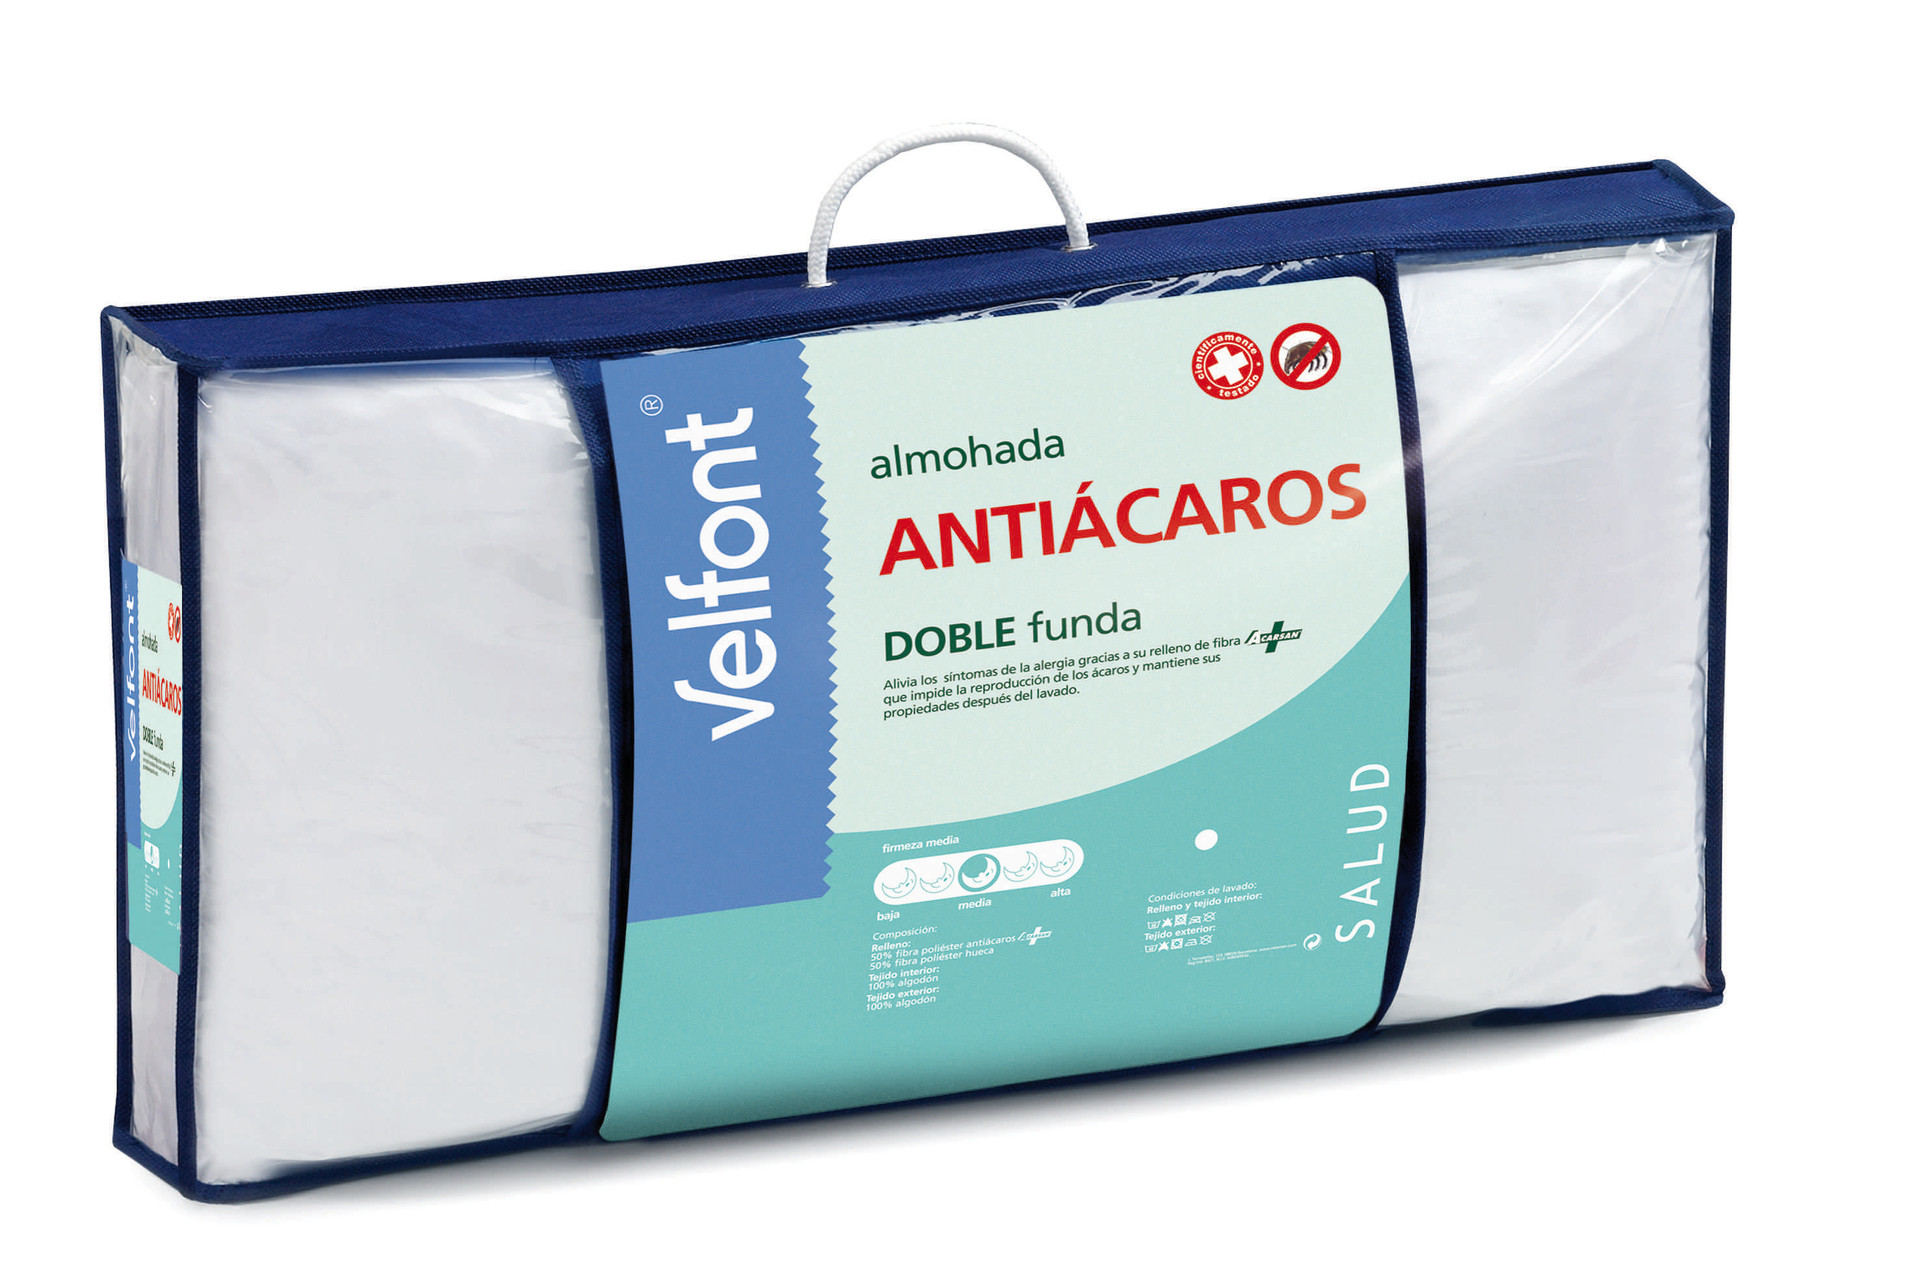 ALMOHADA ANTIÁCAROS